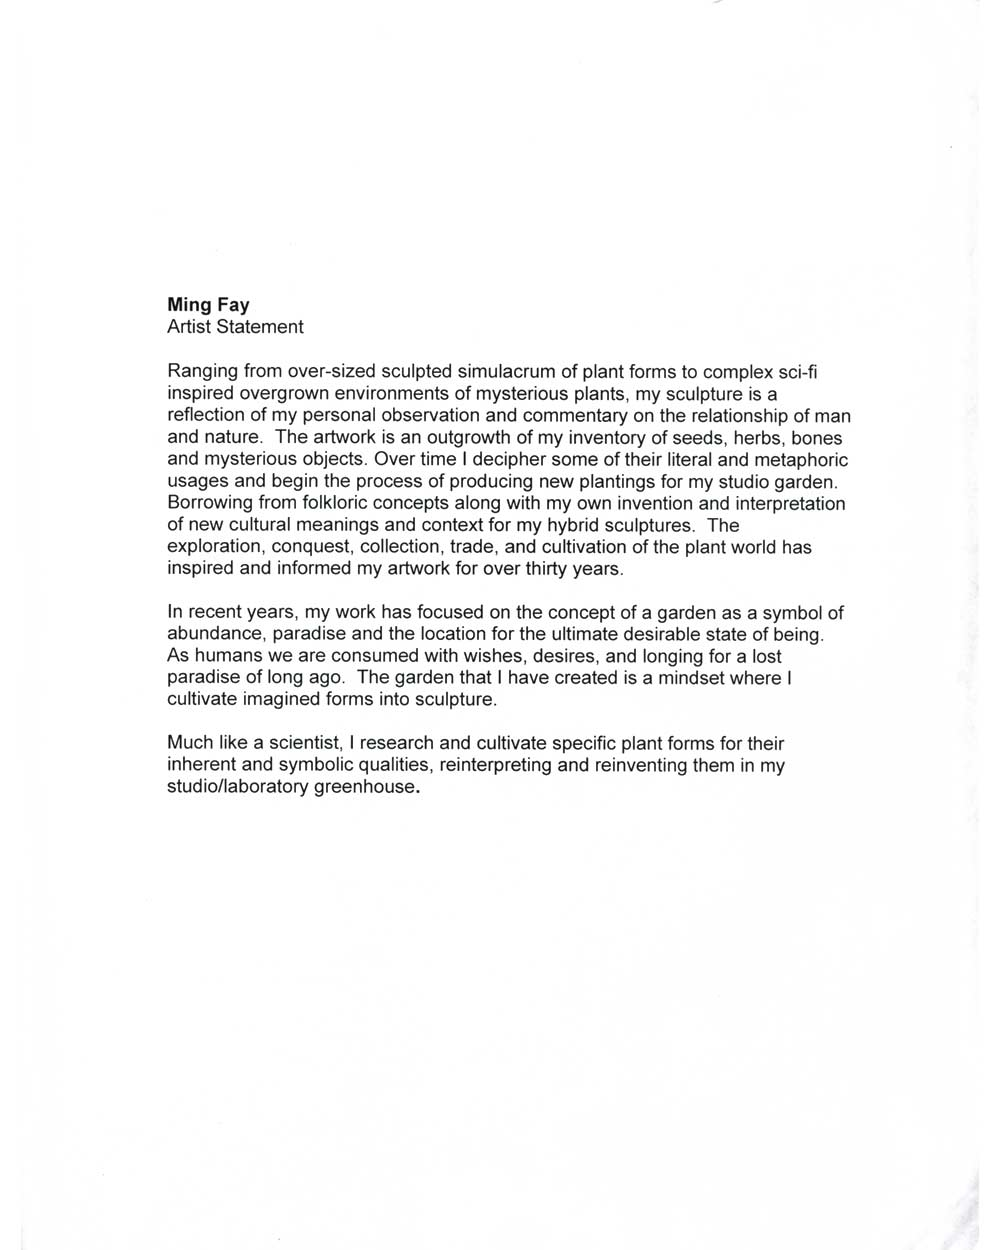 Ming Fay's Artist Statement